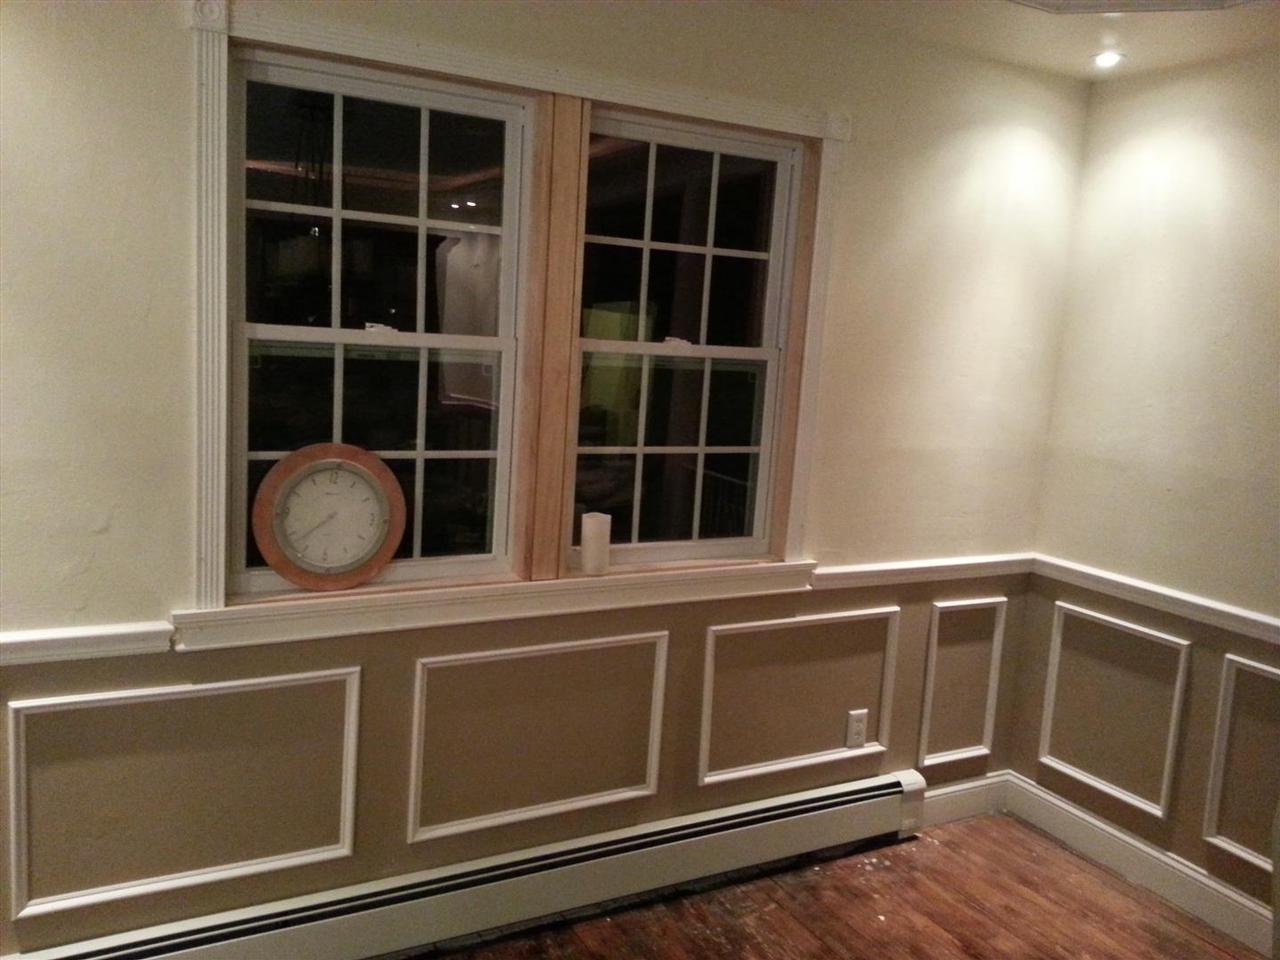 BAD Renovations Dining Room